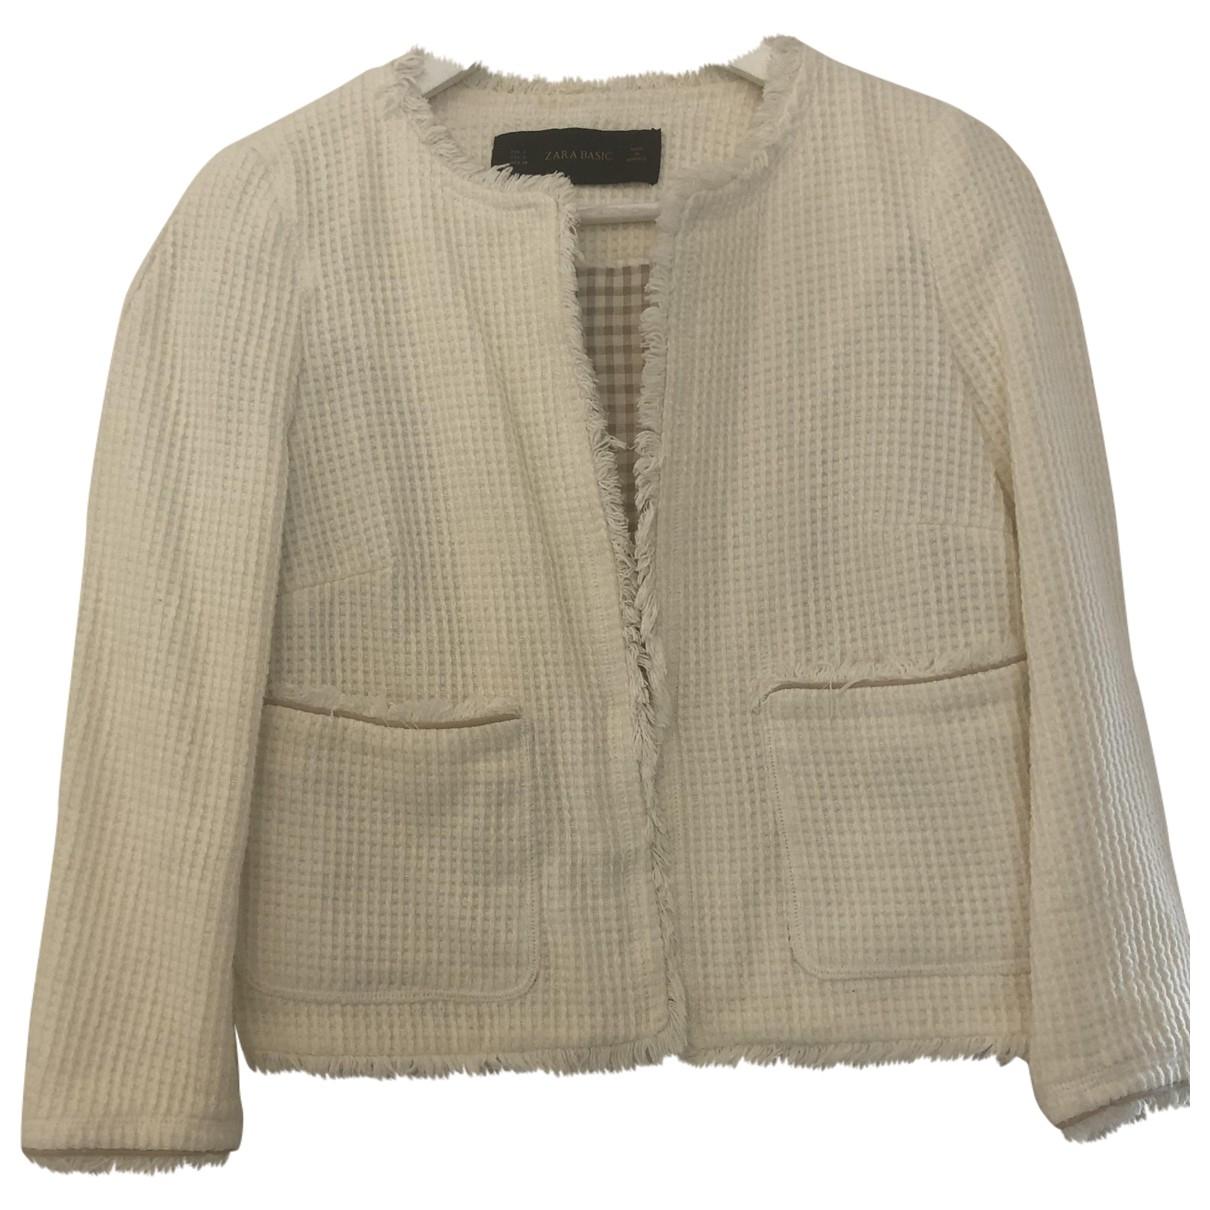 Zara \N White Cotton jacket for Women S International